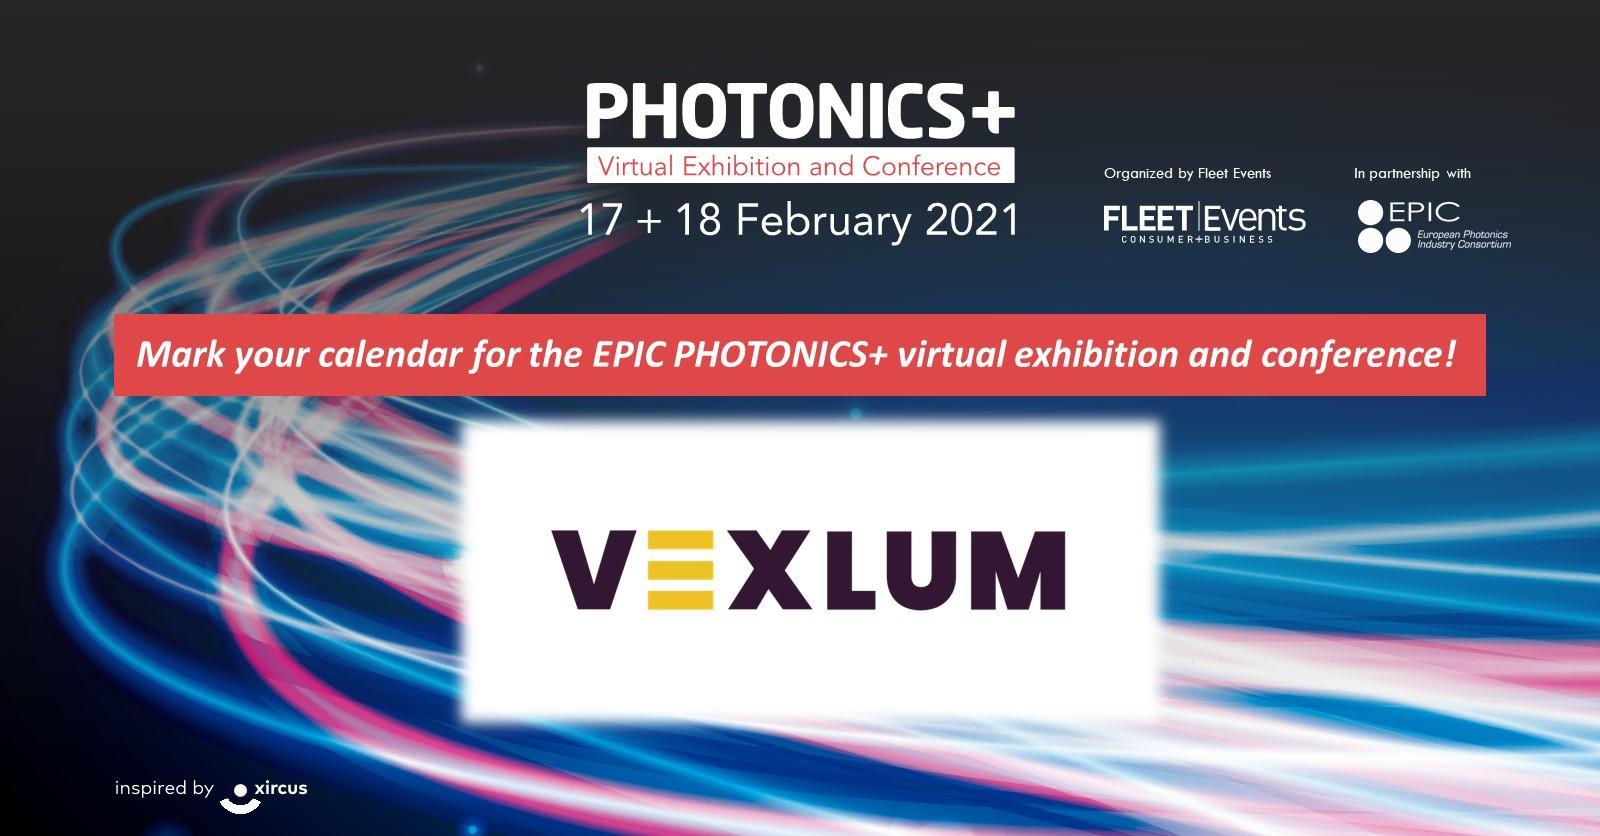 Vexlum Exhibiting at PHOTONICSPLUS